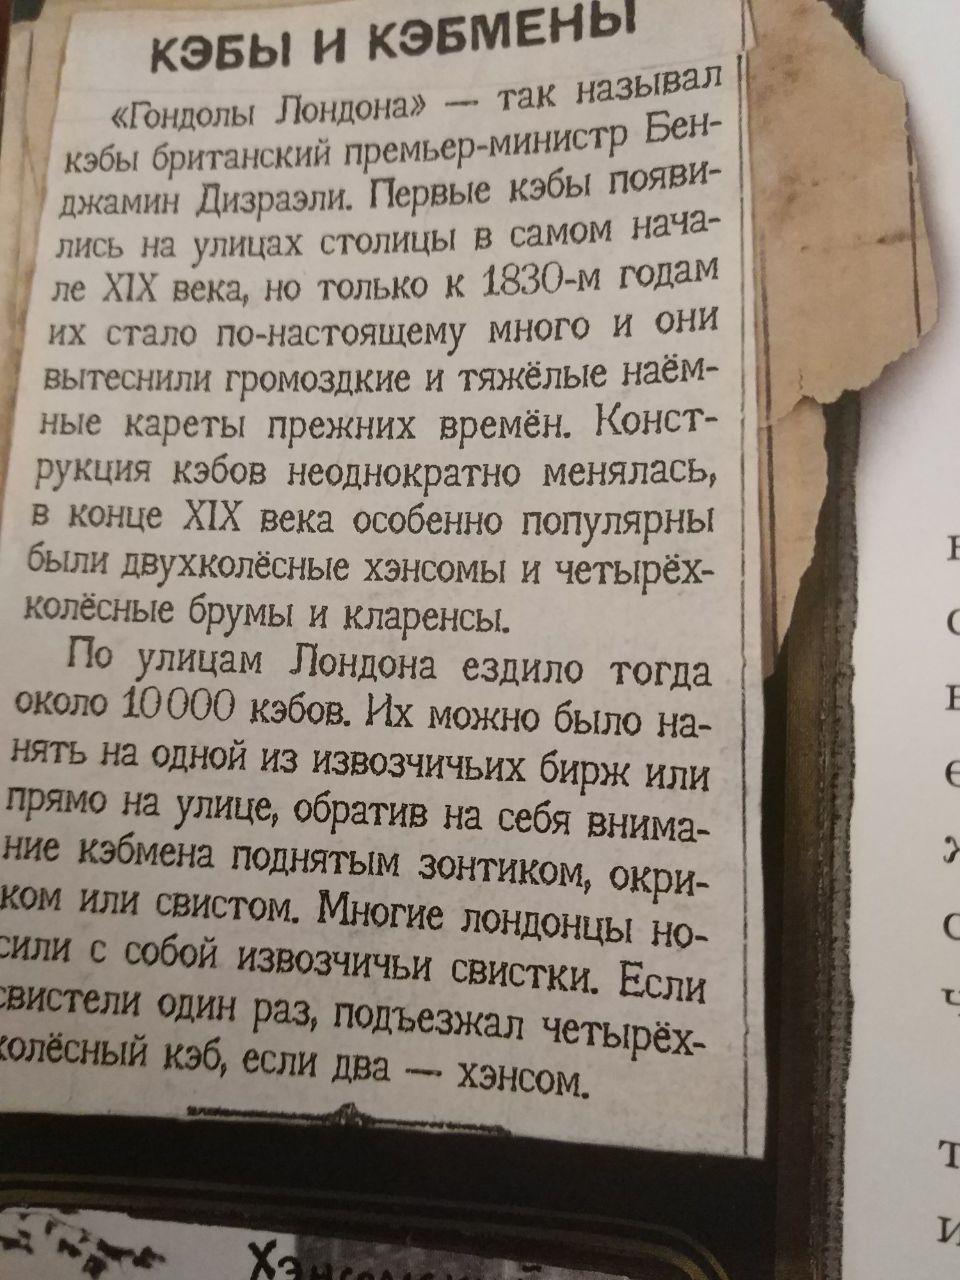 http://s9.uploads.ru/boW5R.jpg